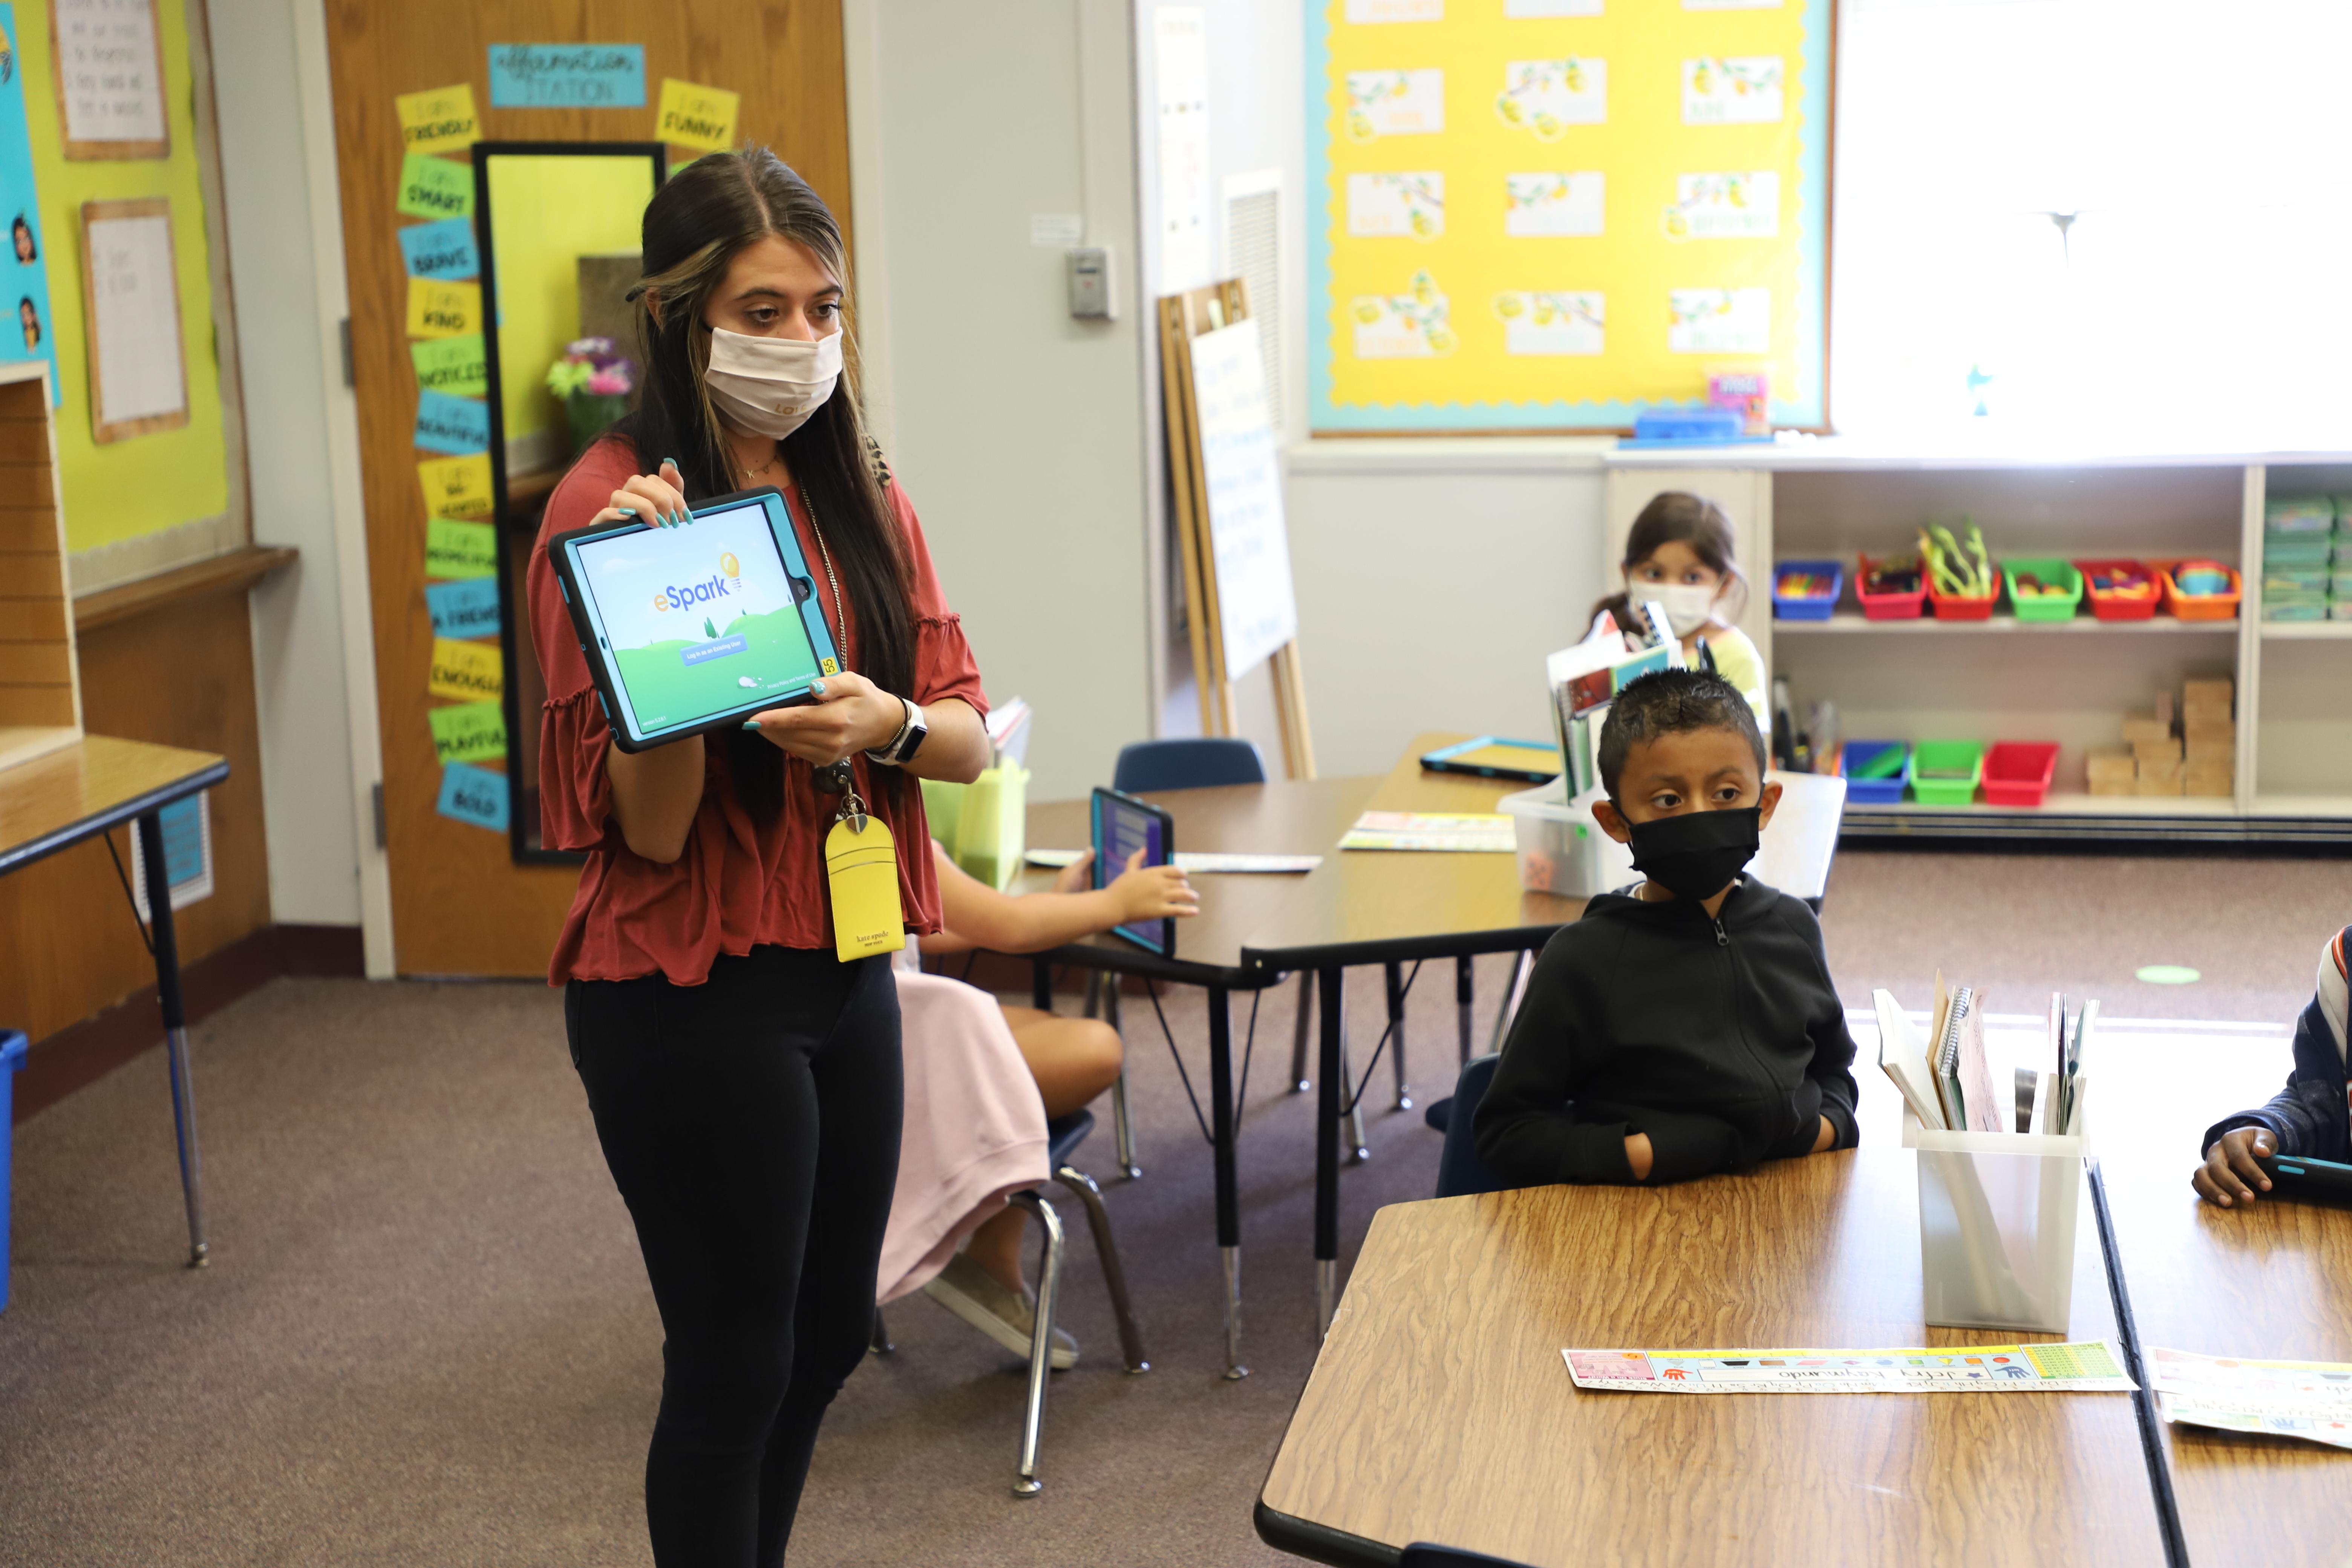 Dakota Wesslund holds a tablet while Jefry Raymundo-Chumux looks toward the camera in Wesslund's first-grade classroom at Mockingbird Elementary. (Jim Frederick/Ralston Public Schools)